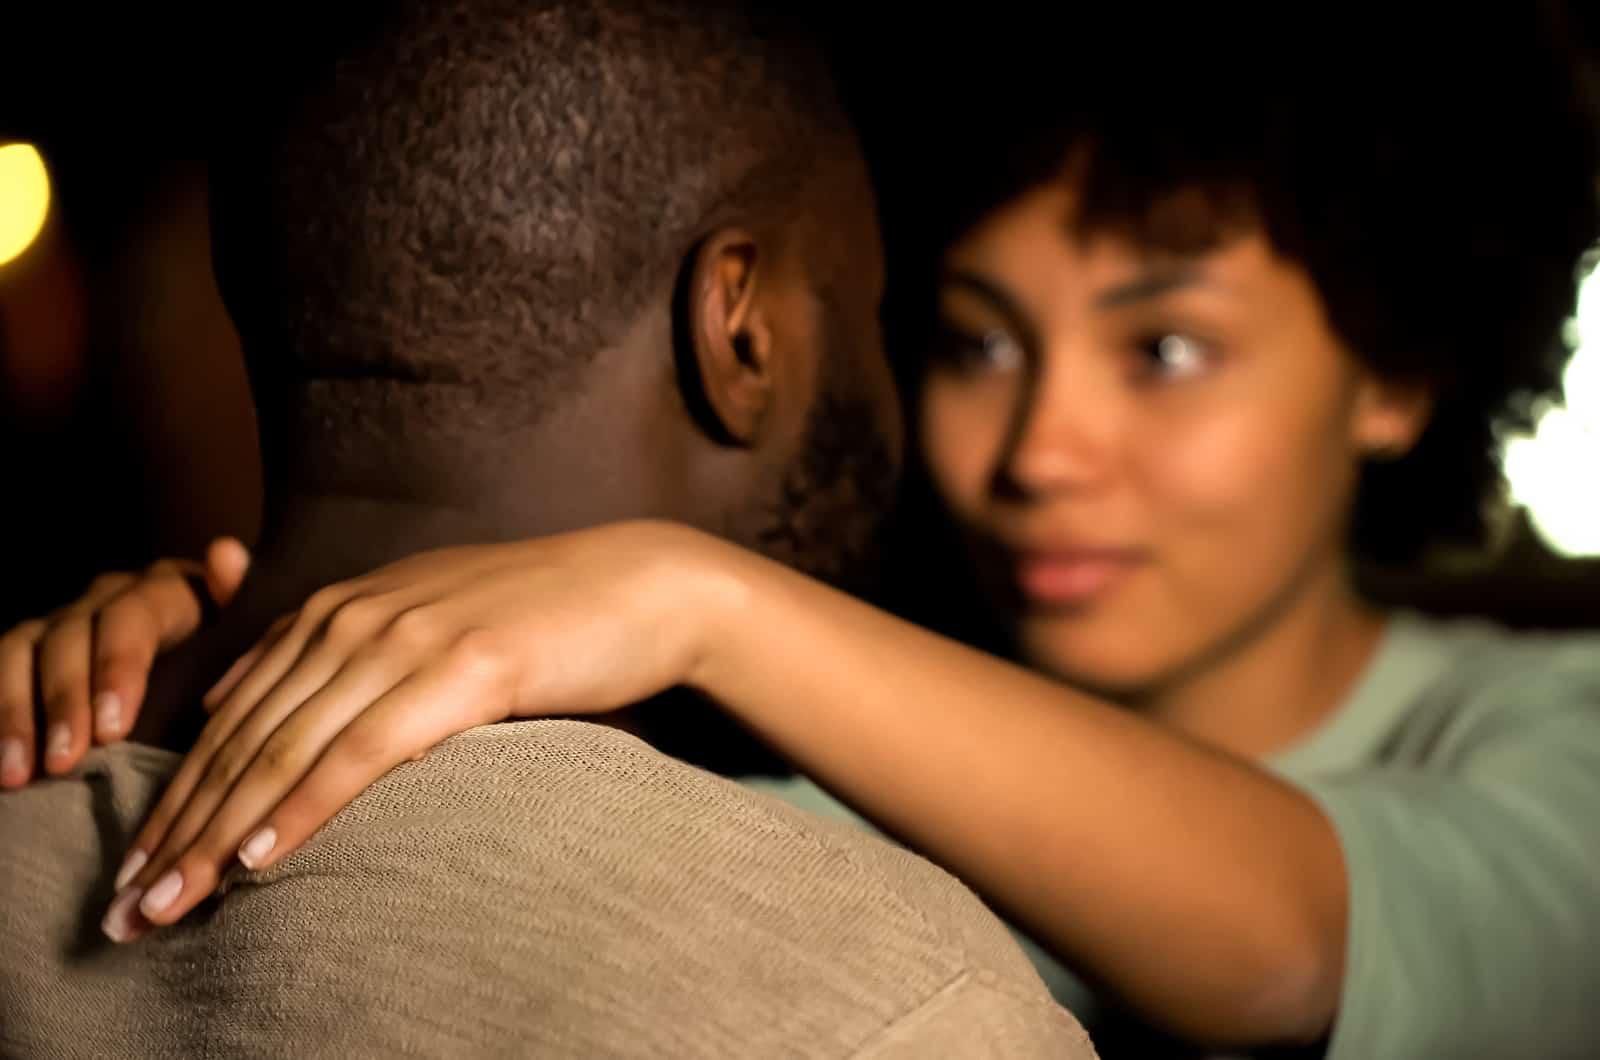 Frau umarmt einen Mann